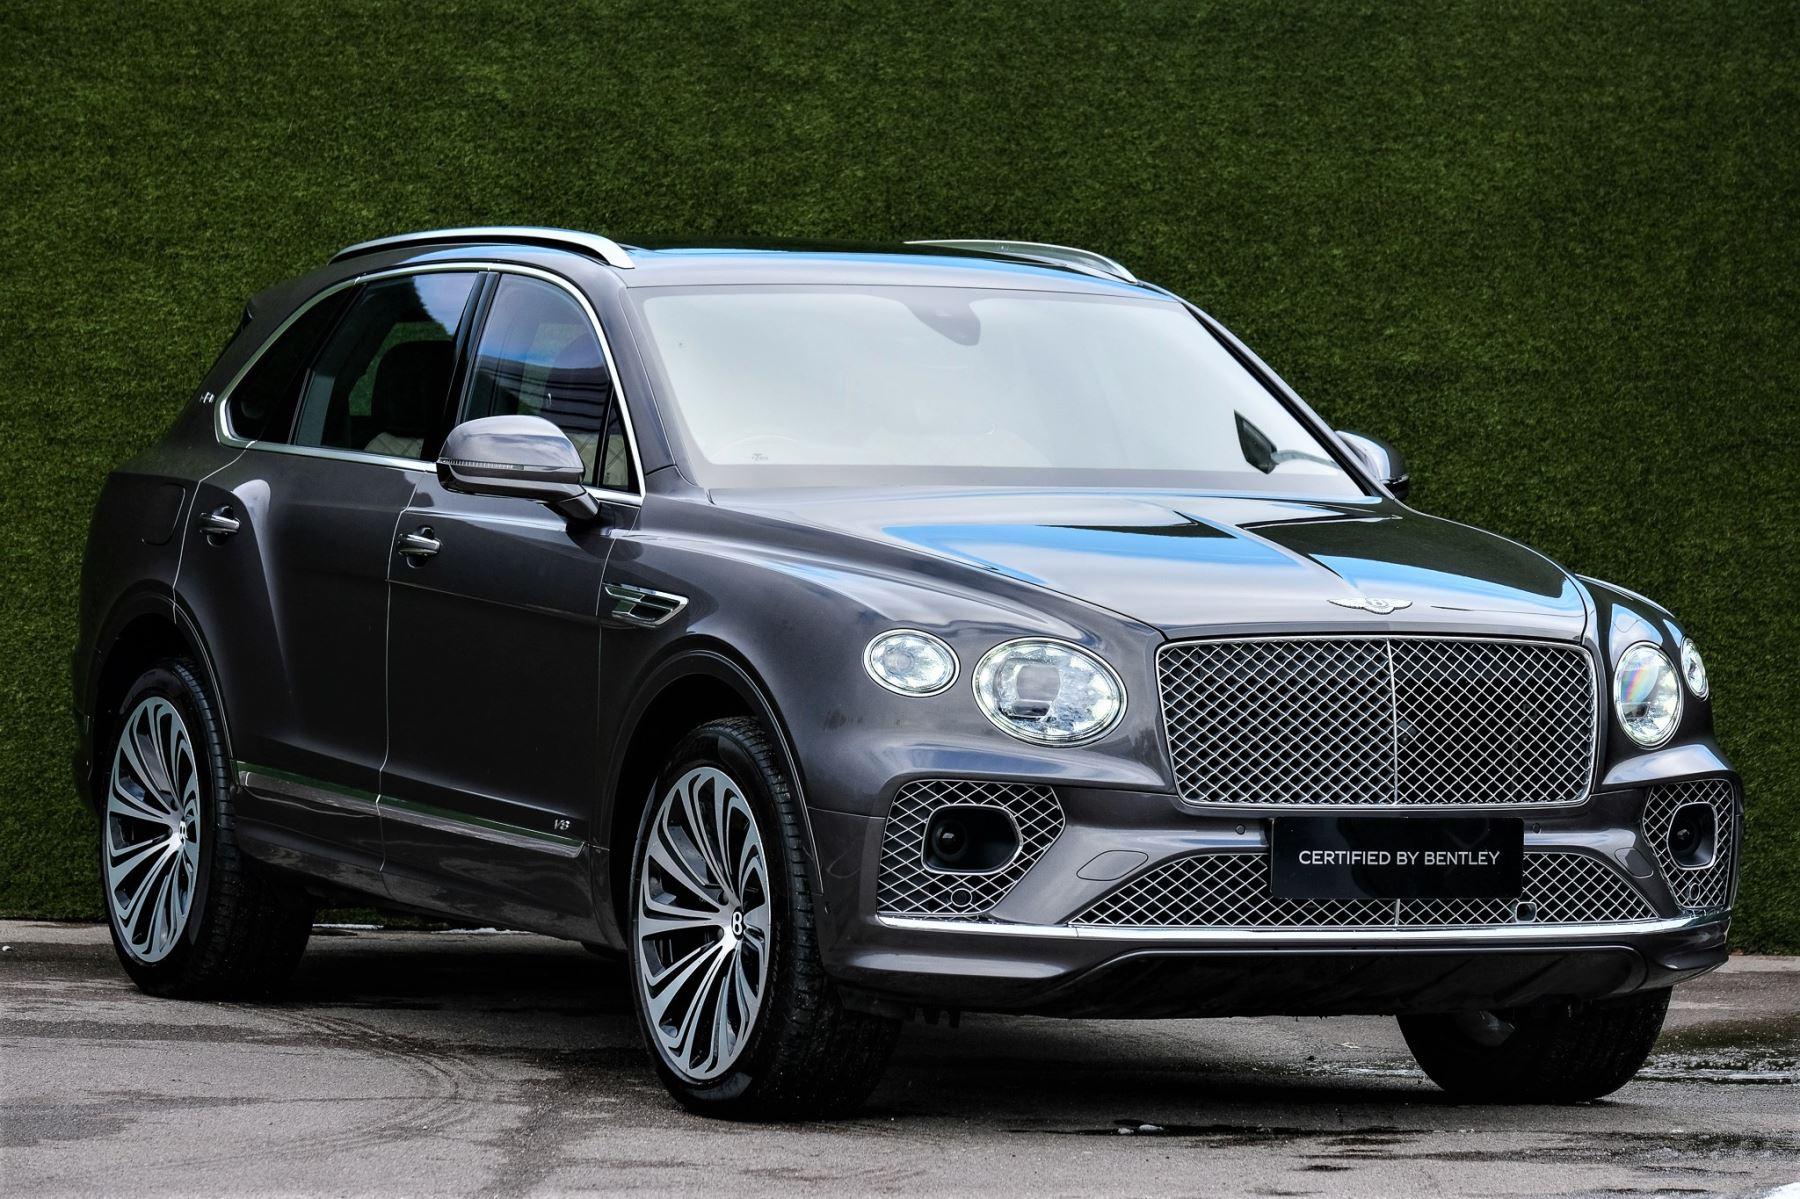 Bentley Bentayga First Edition 4.0 V8  image 1